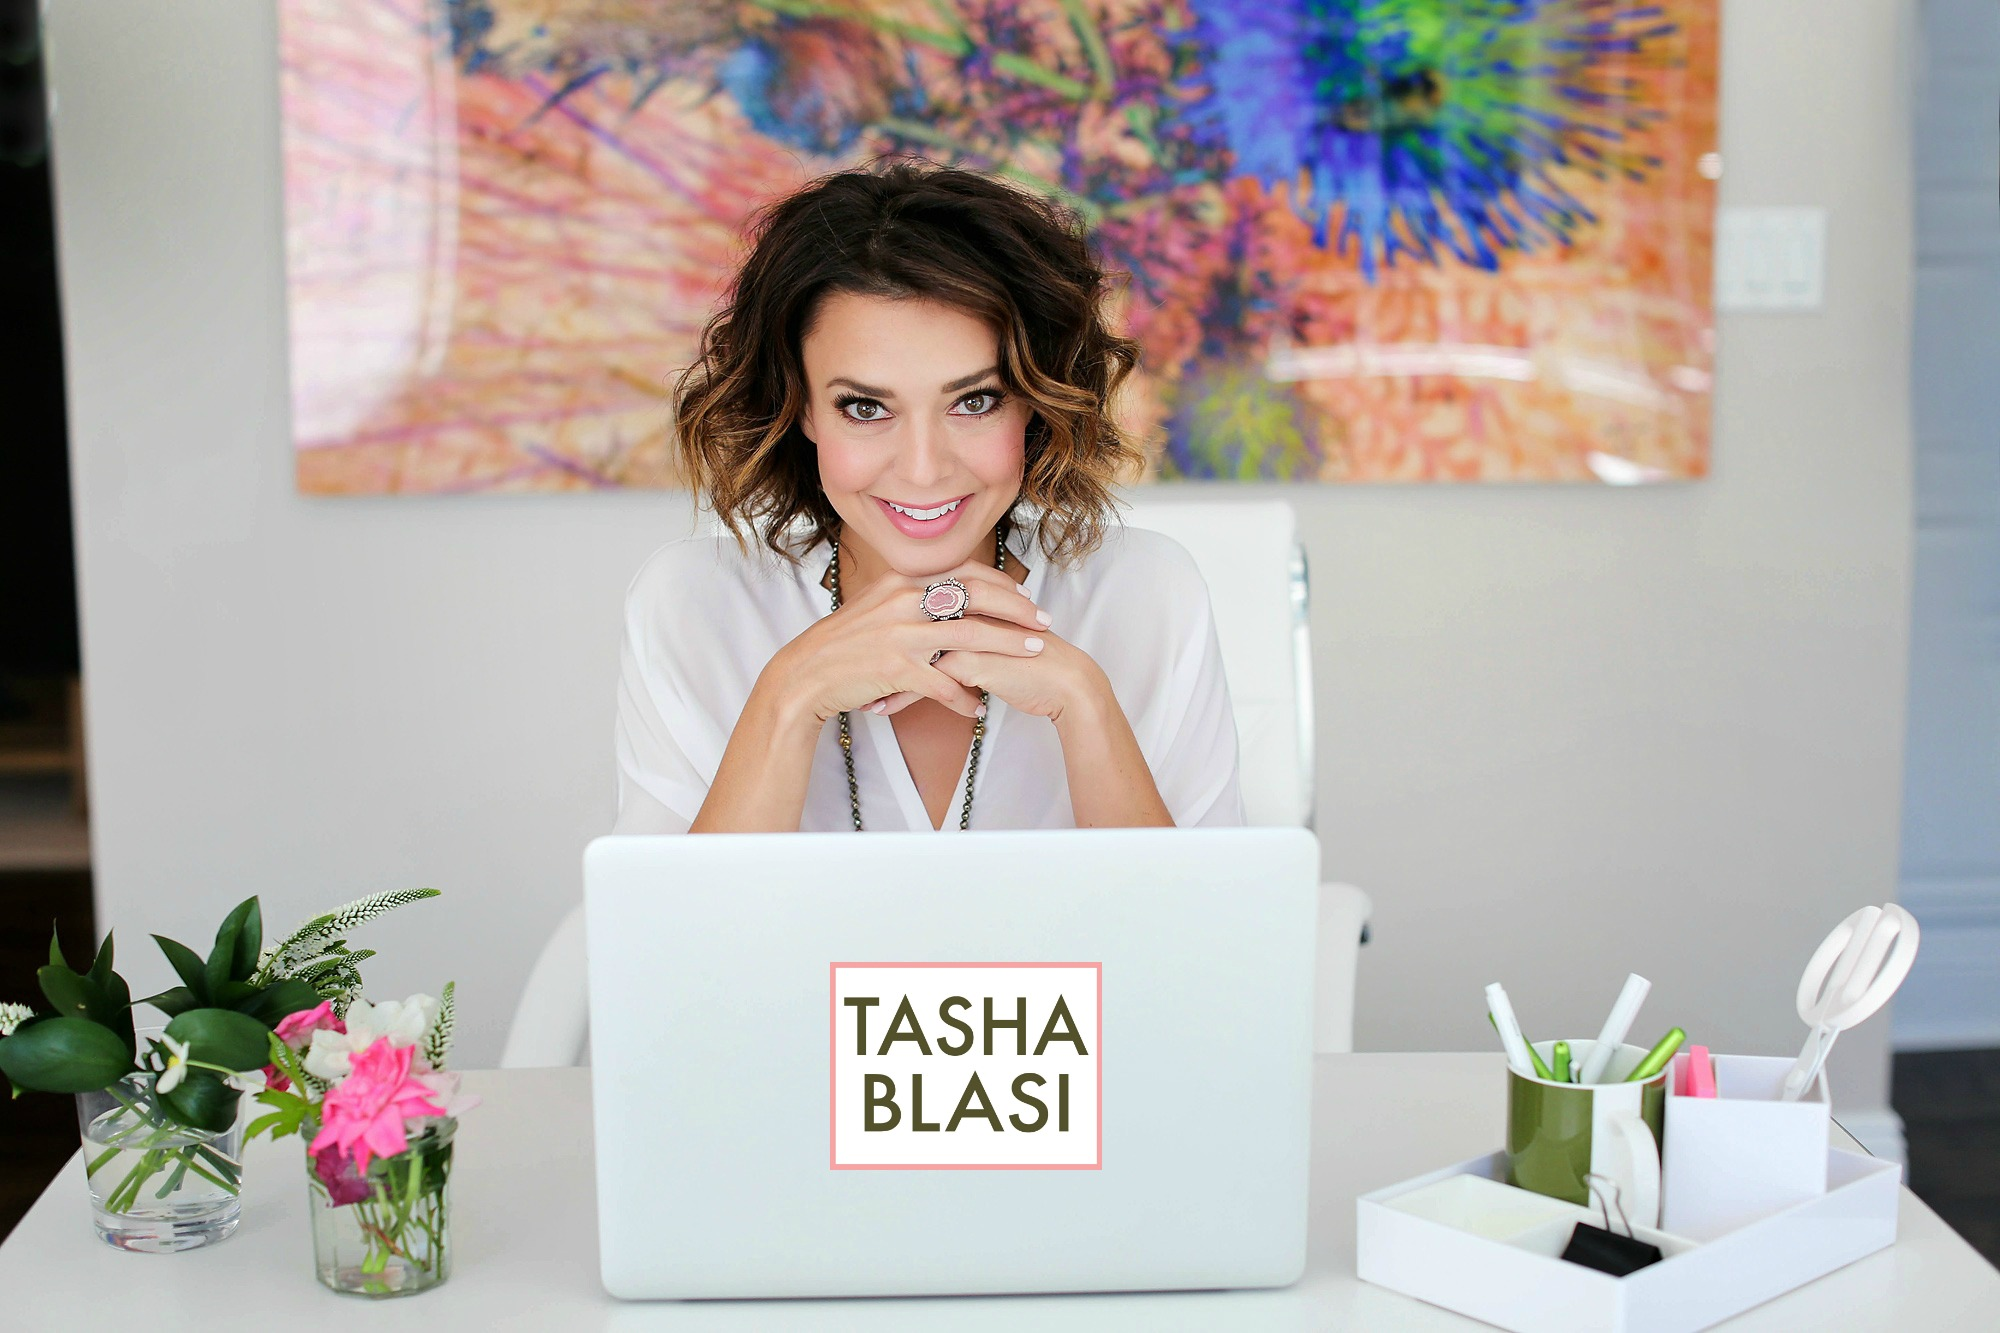 Tasha Blasi, Founder of the FertilitiTes Unite Project (FU Project)